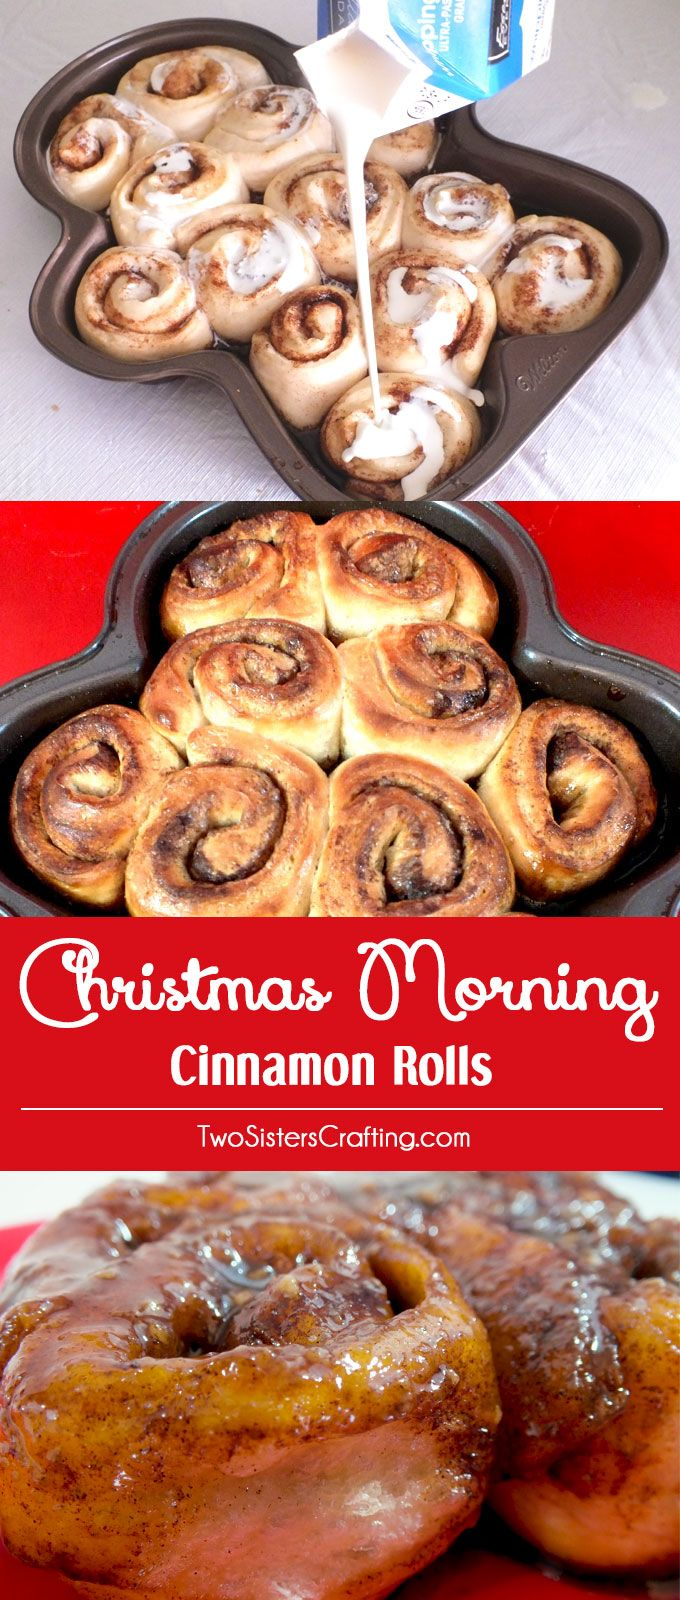 Christmas Cinnamon Rolls.Christmas Morning Cinnamon Rolls